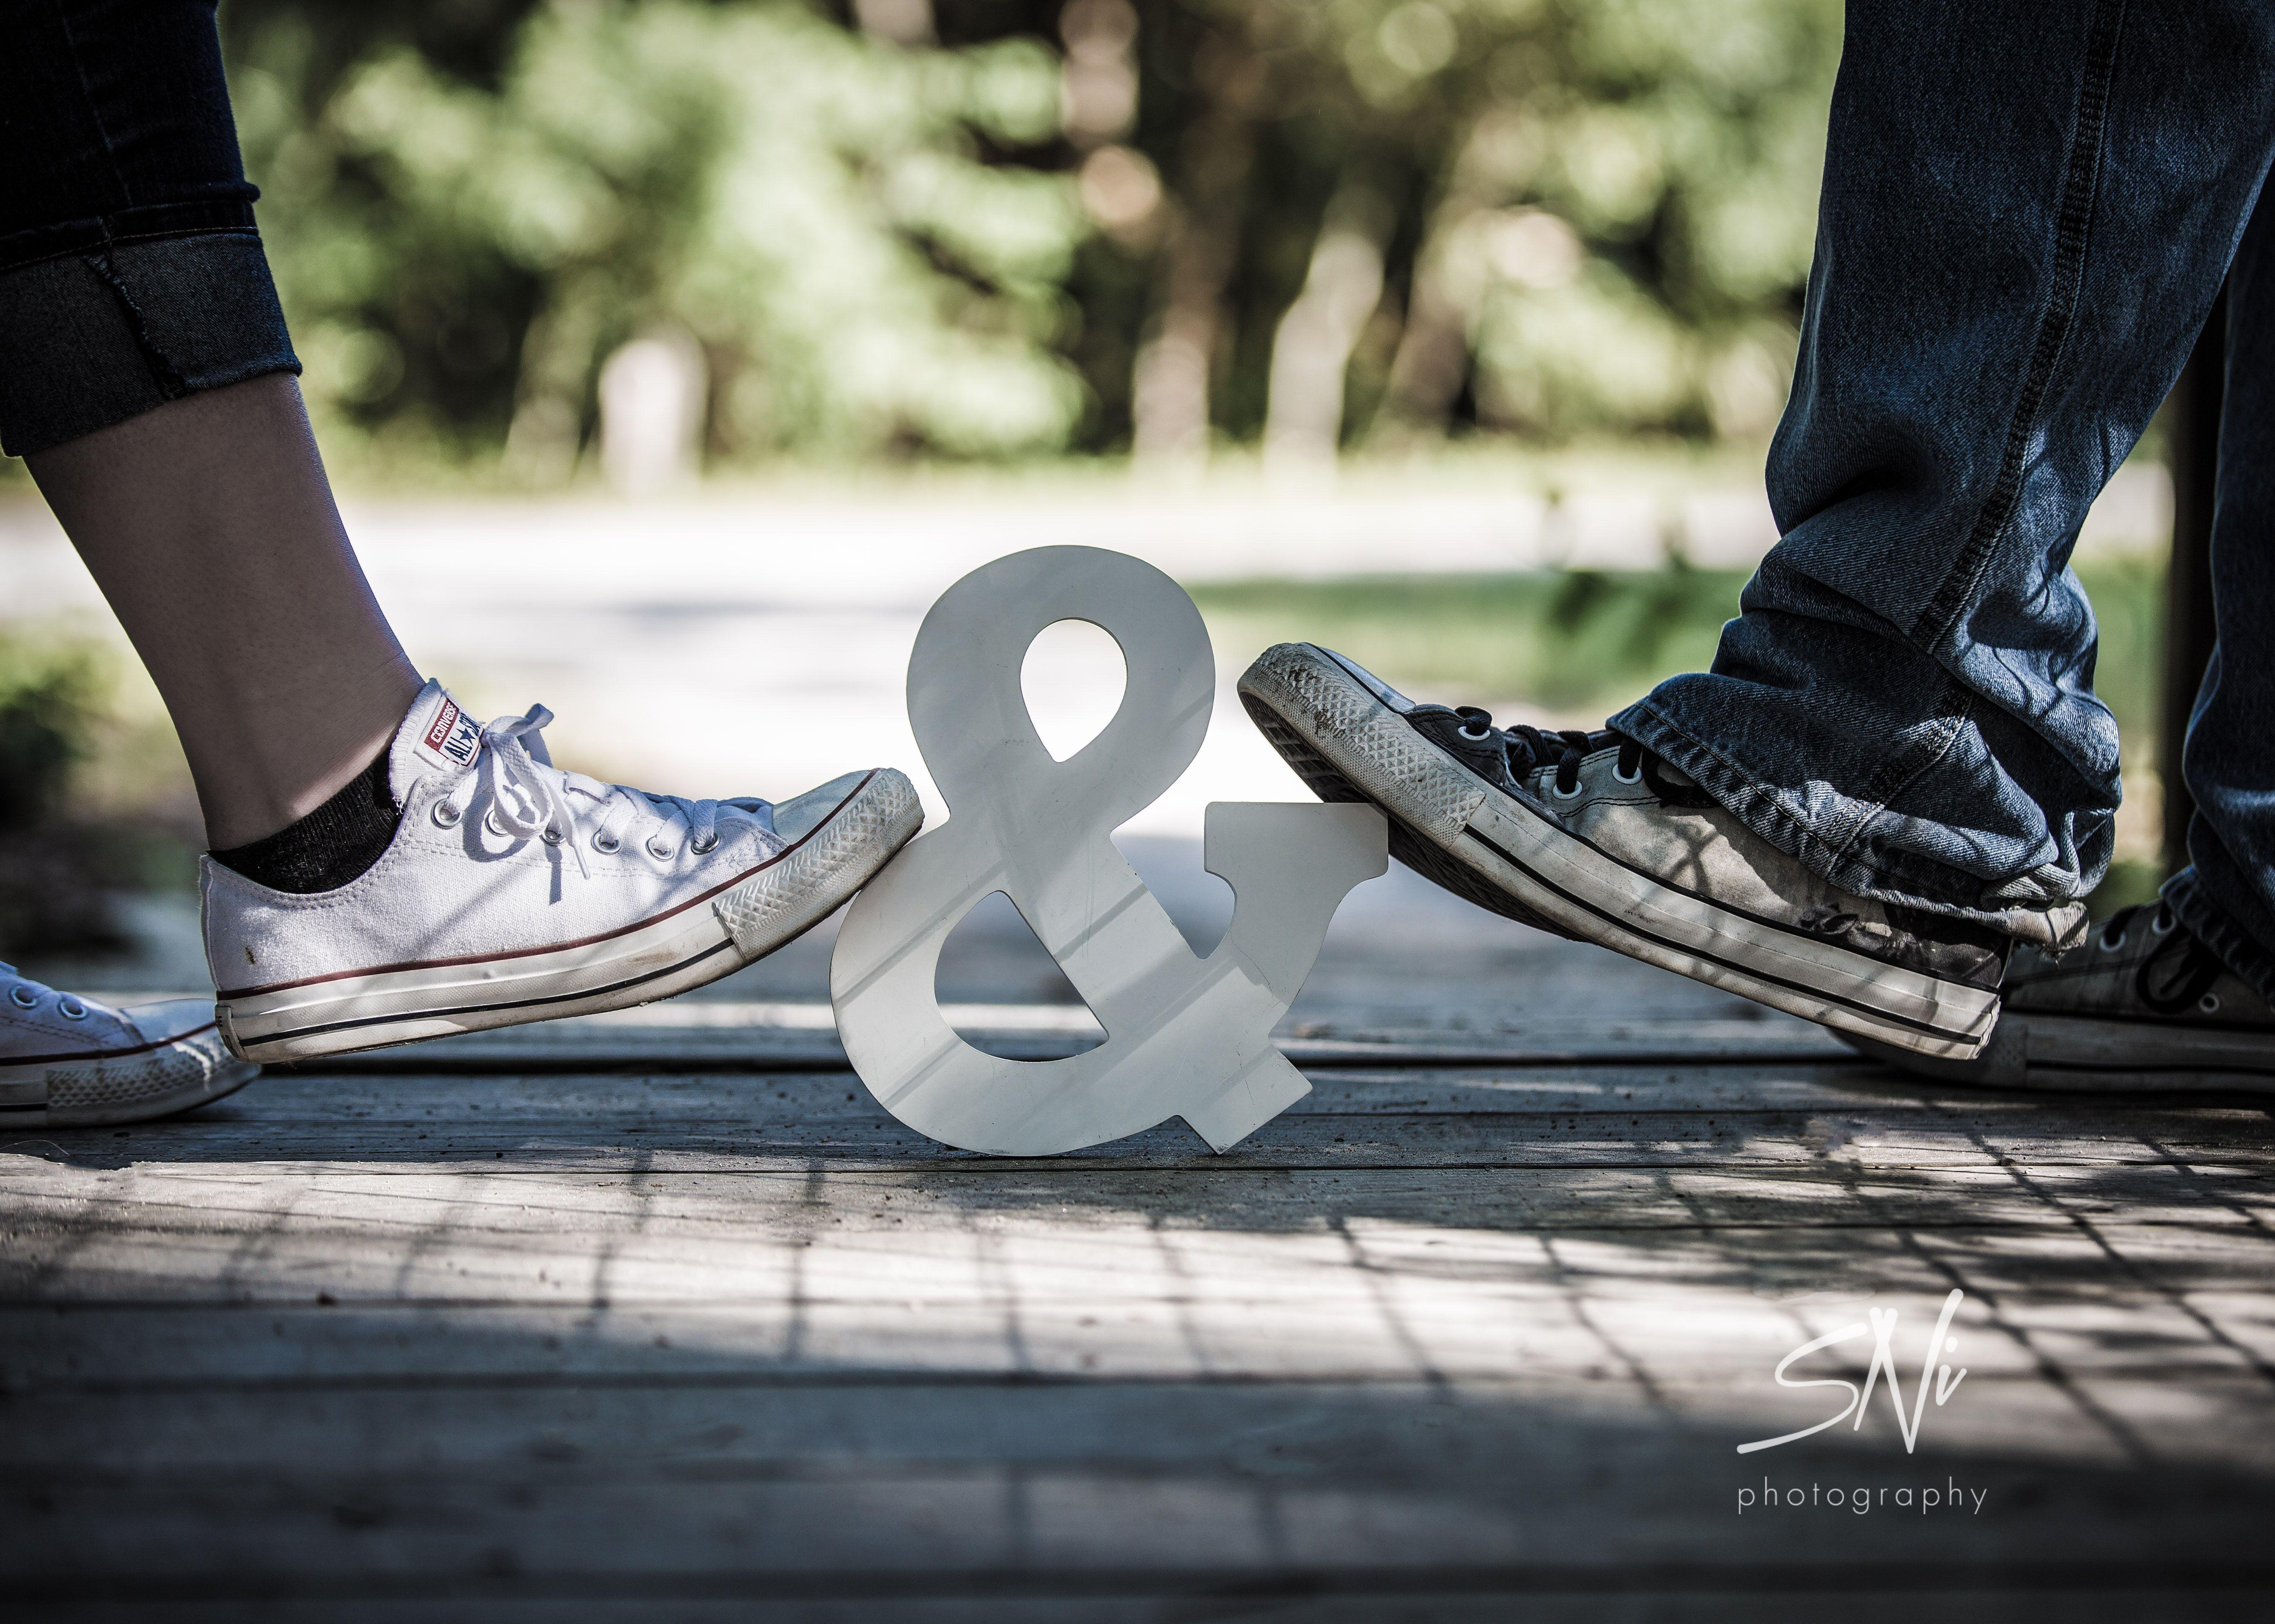 Ipw Reception Corporate Event Photographyorlando Wedding: A Fun Engagement Shoot At Jacksonville Arboretum